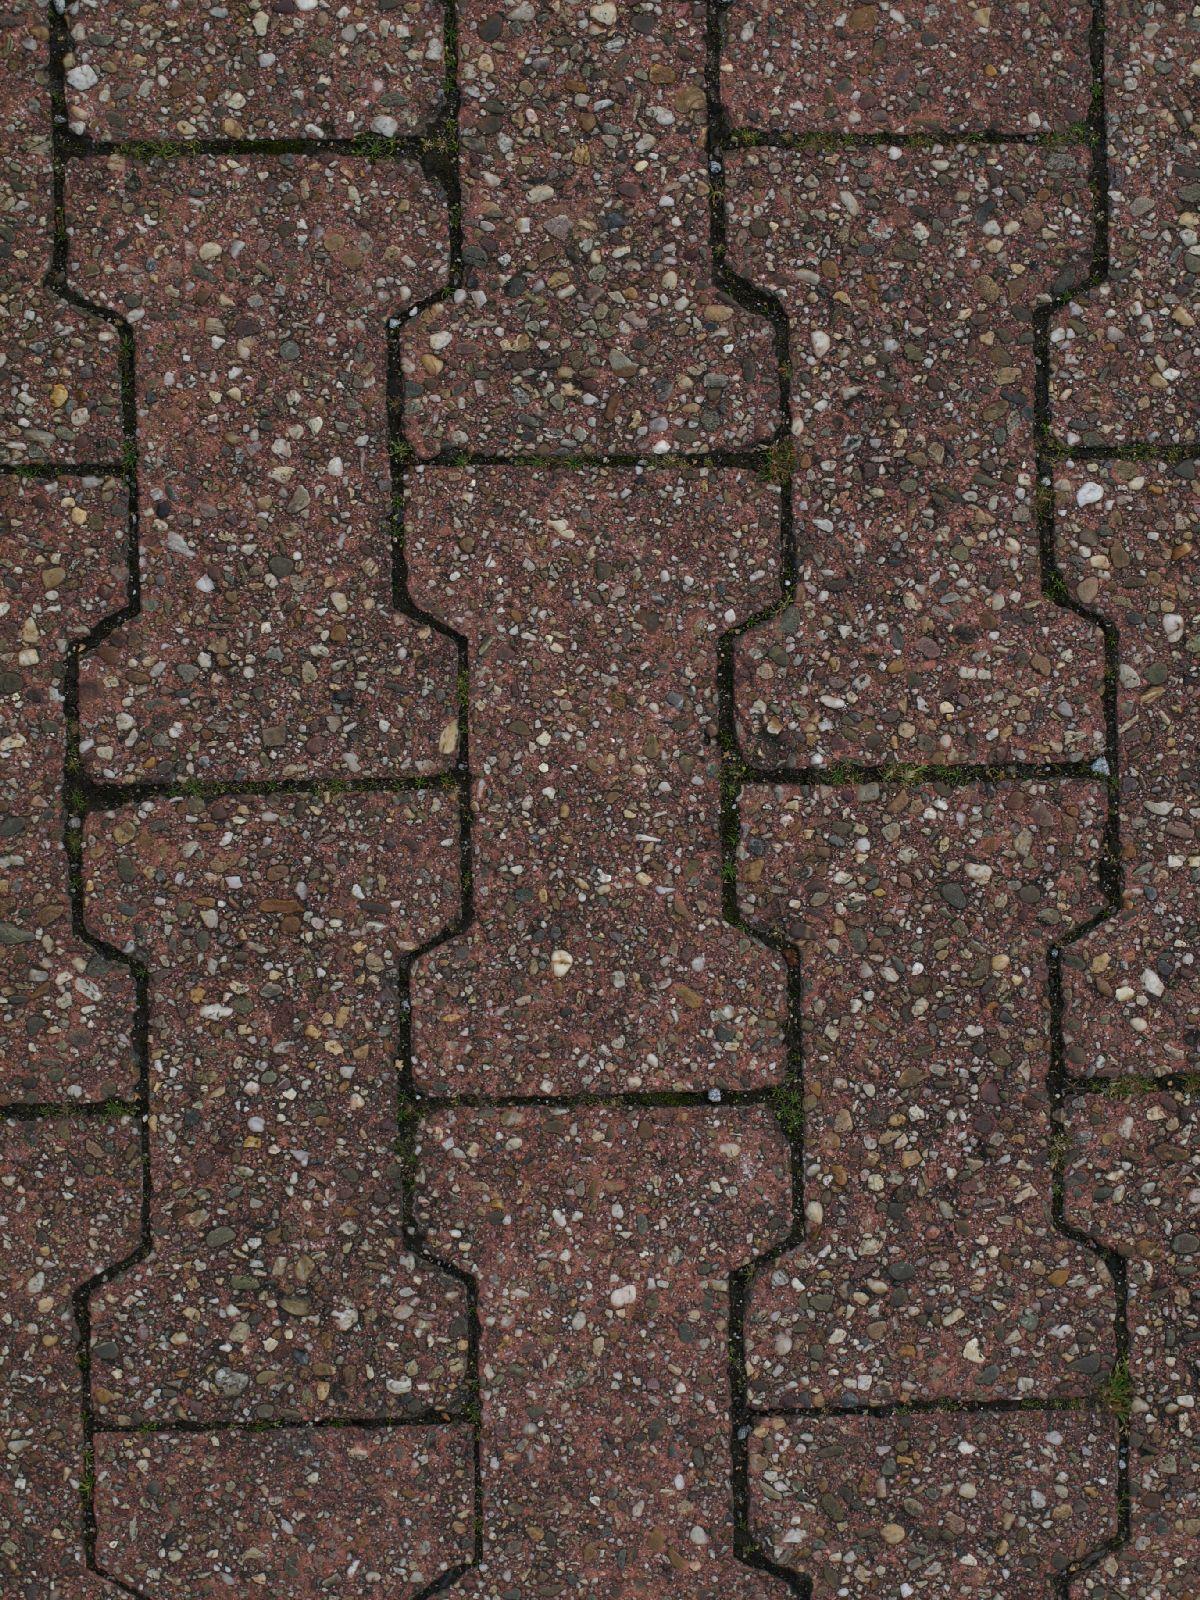 Boden-Gehweg-Strasse-Buergersteig-Textur_A_PA045721